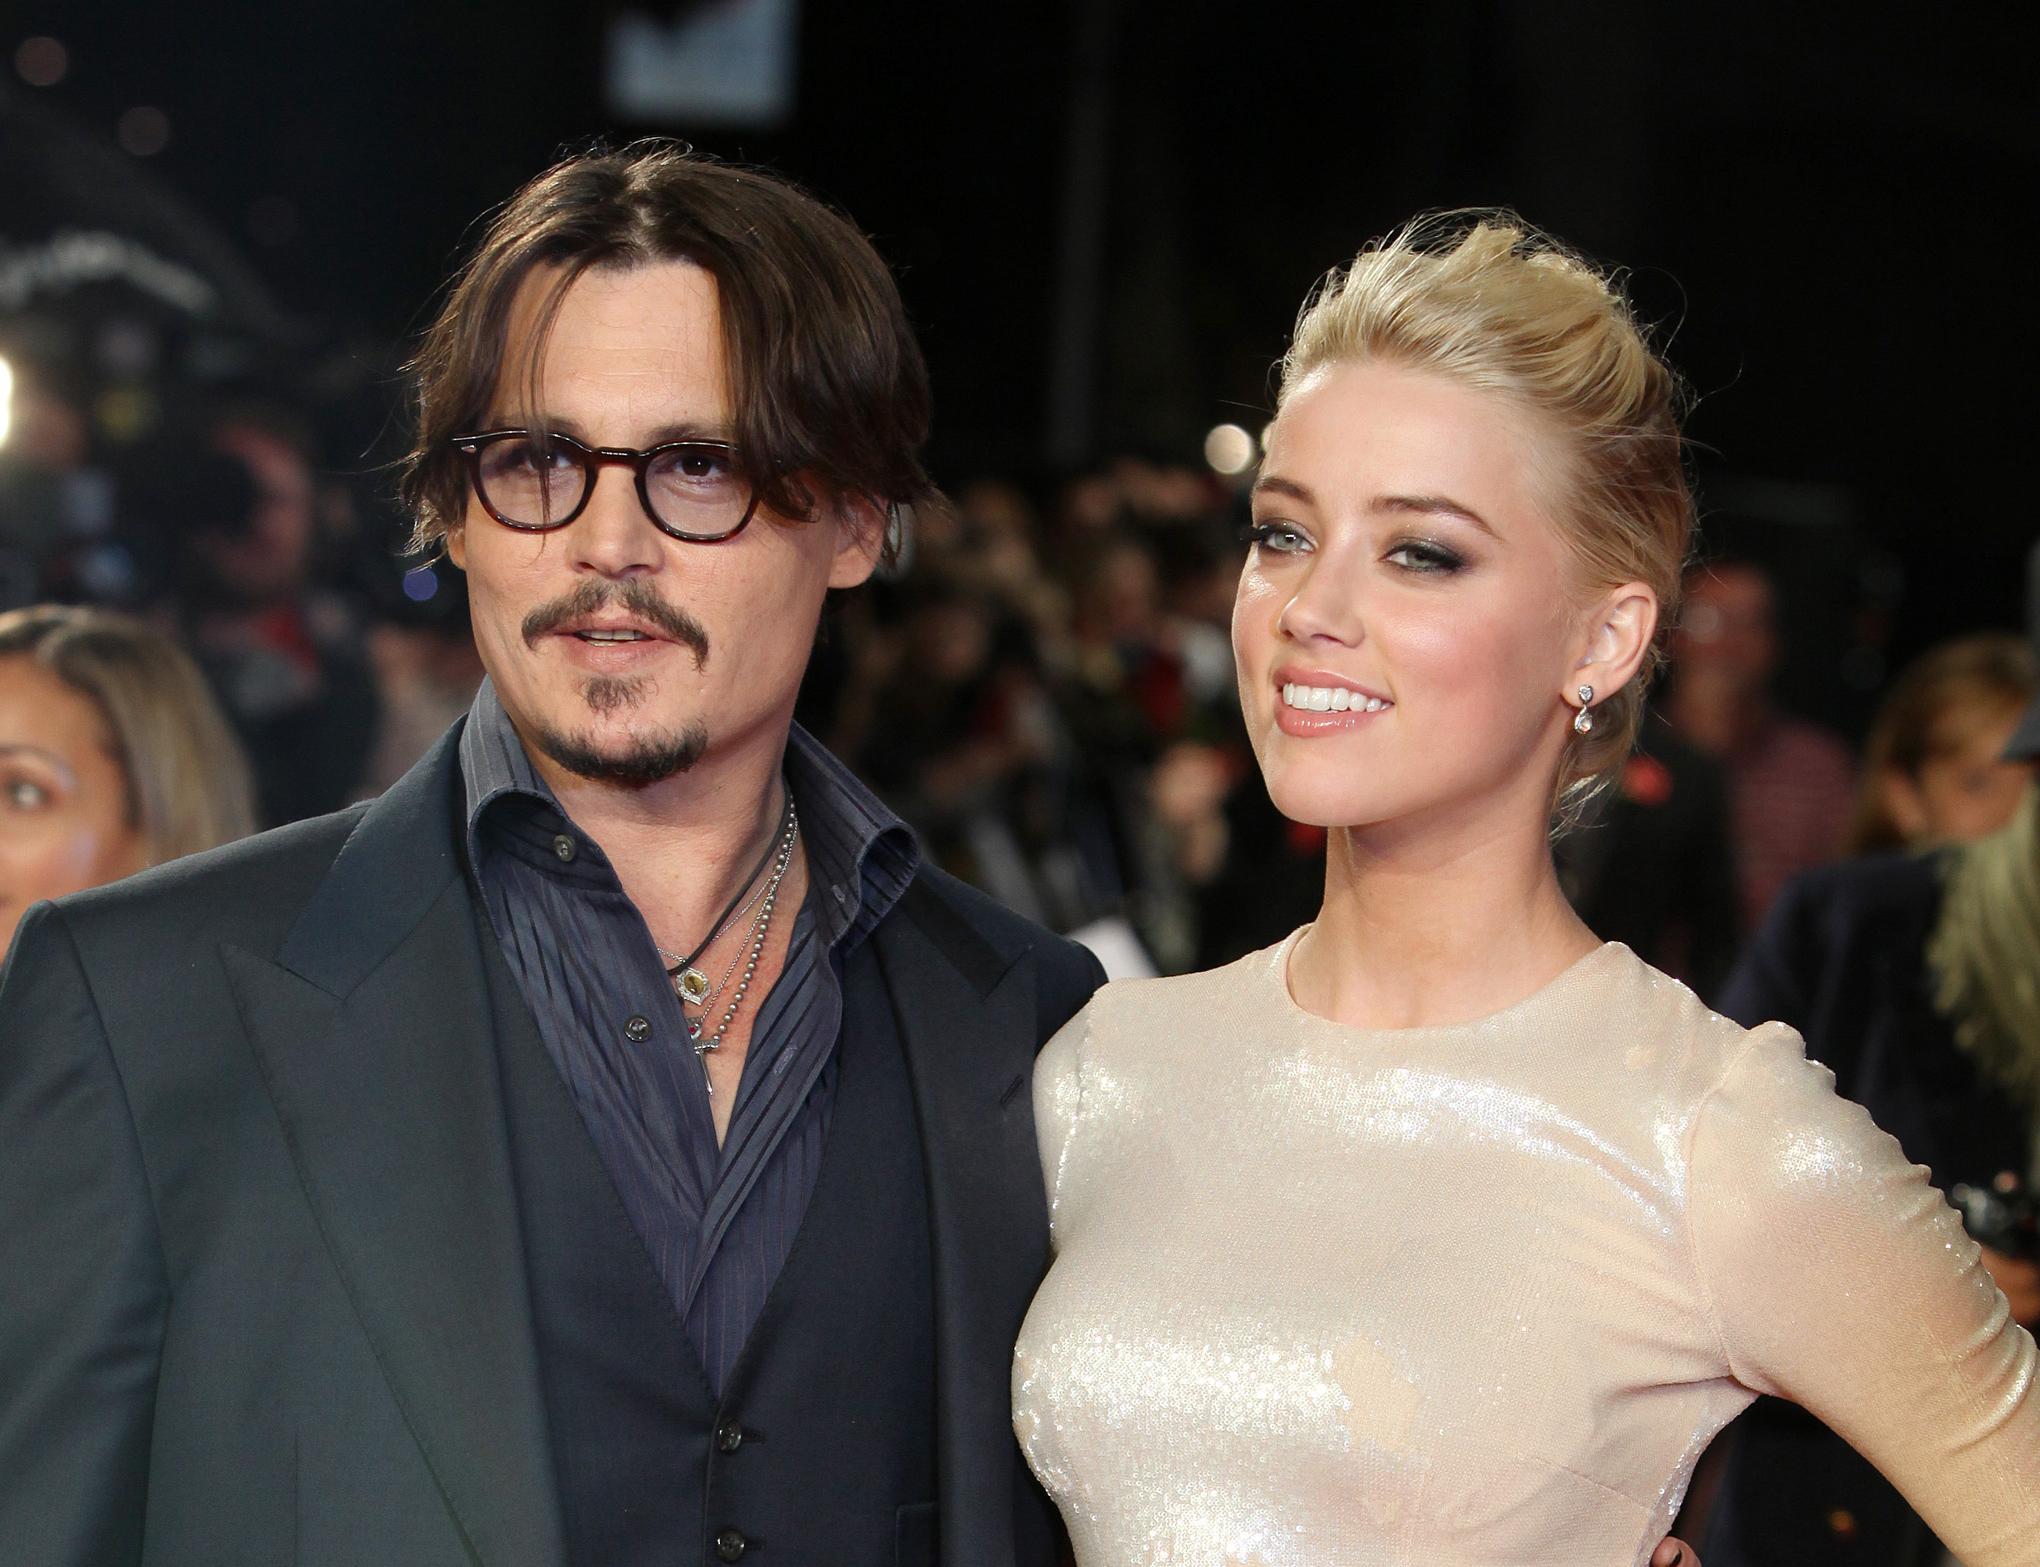 Johnny Depp and Amber Heard (AP Photo/Joel Ryan)